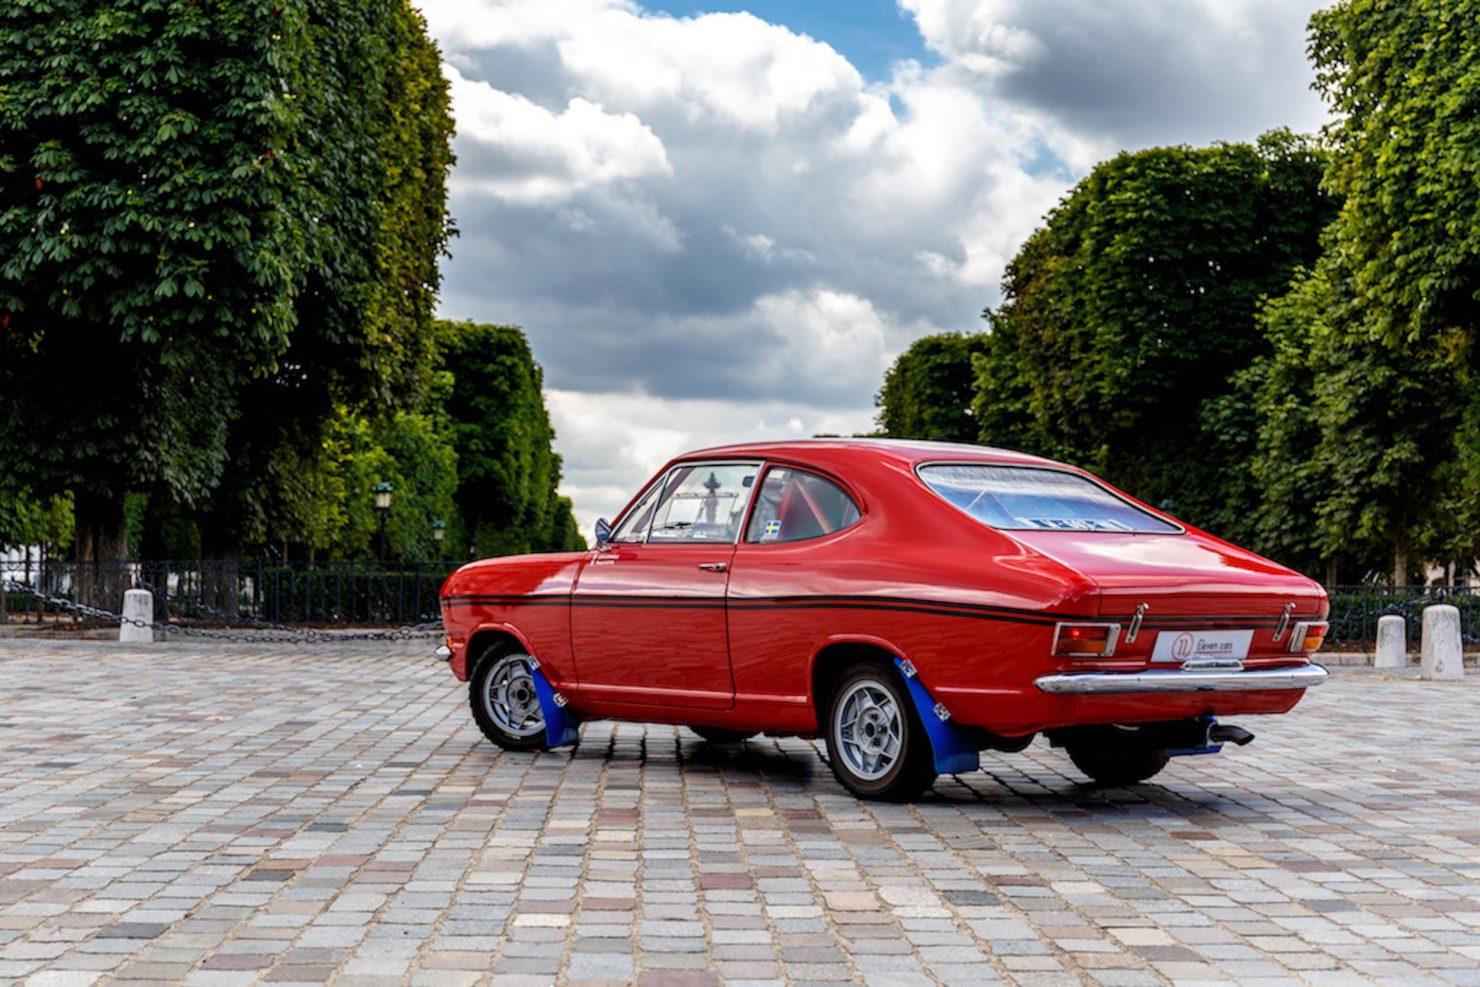 opel kadett rallye car 23 1480x987 - 1969 Opel Rallye Kadett